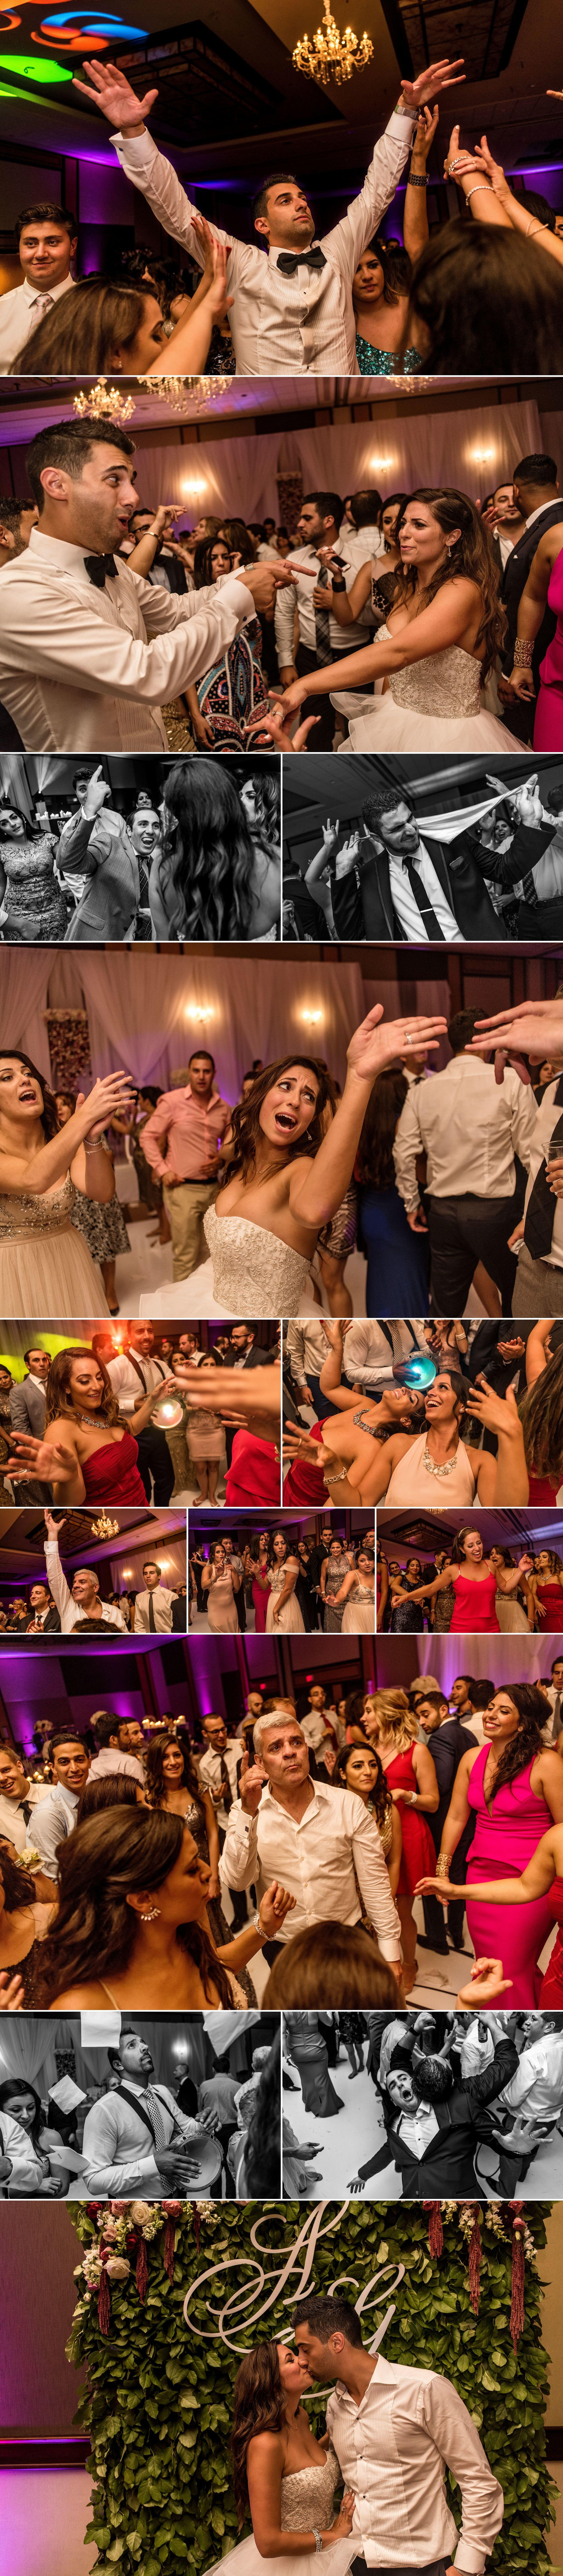 Ottawa wedding reception at the Hilton.